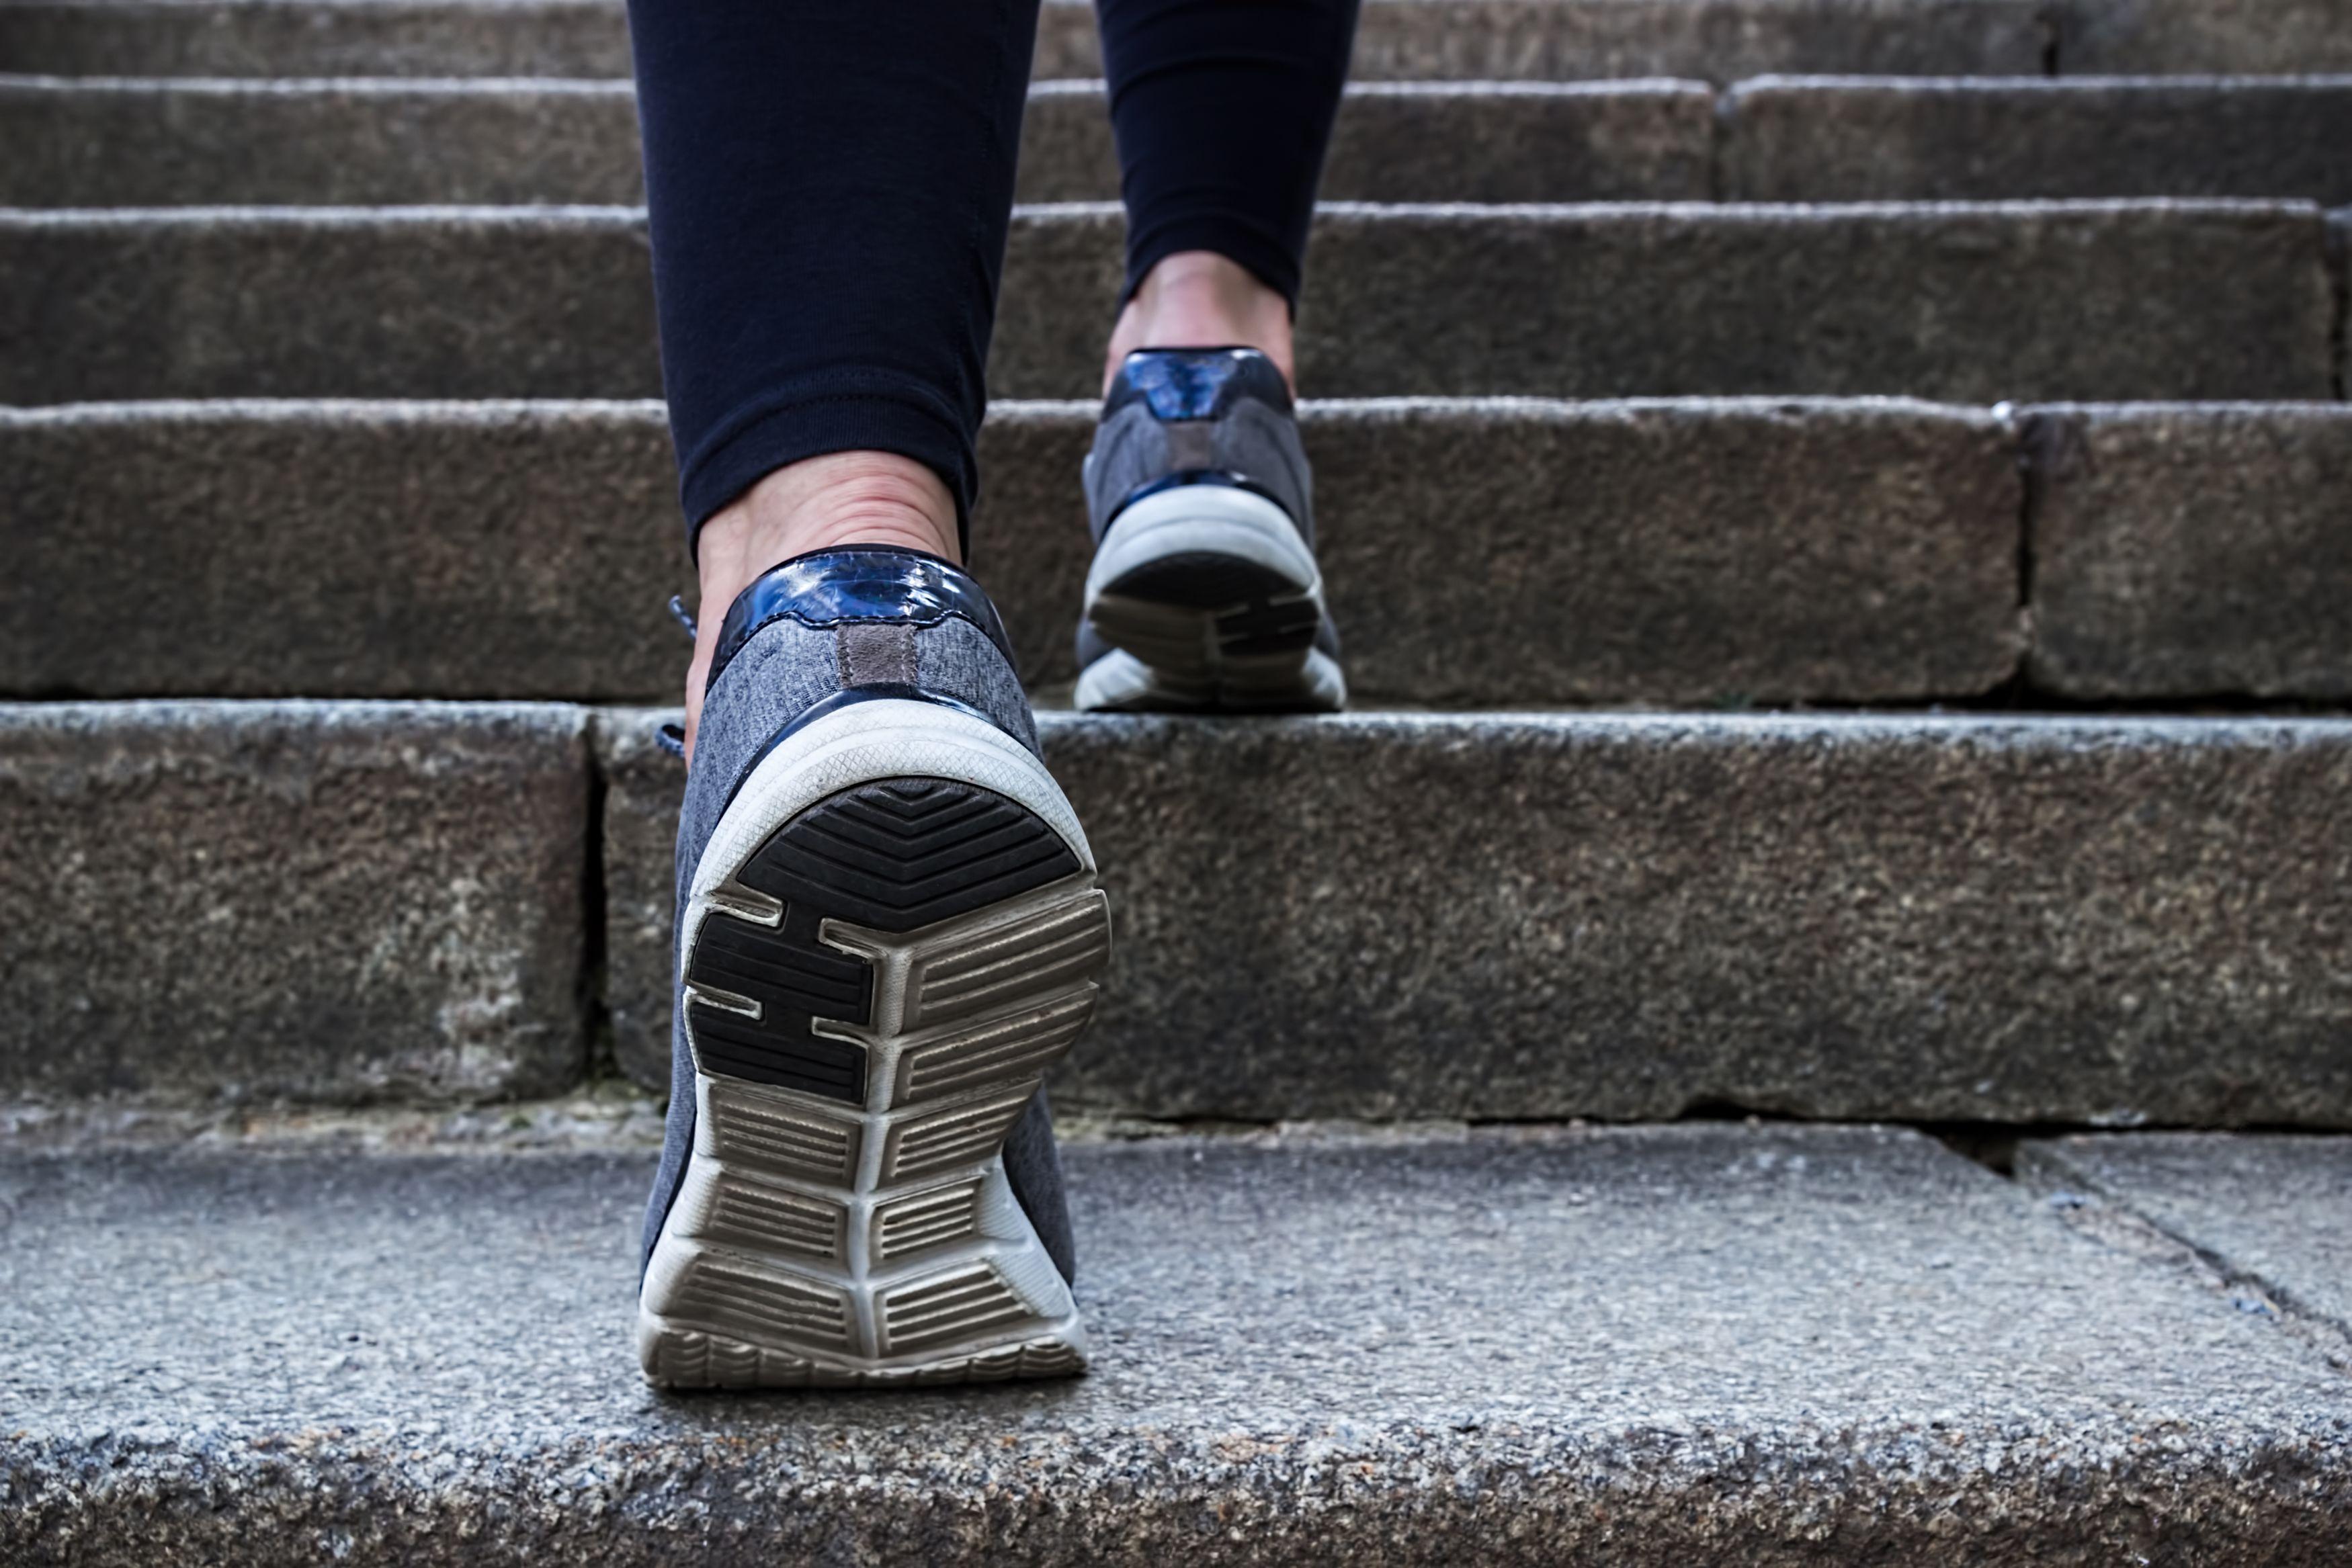 morning-jogging-young-woman-outdoors-royalty-free-image -904954290-1551663251.jpg ea133c899